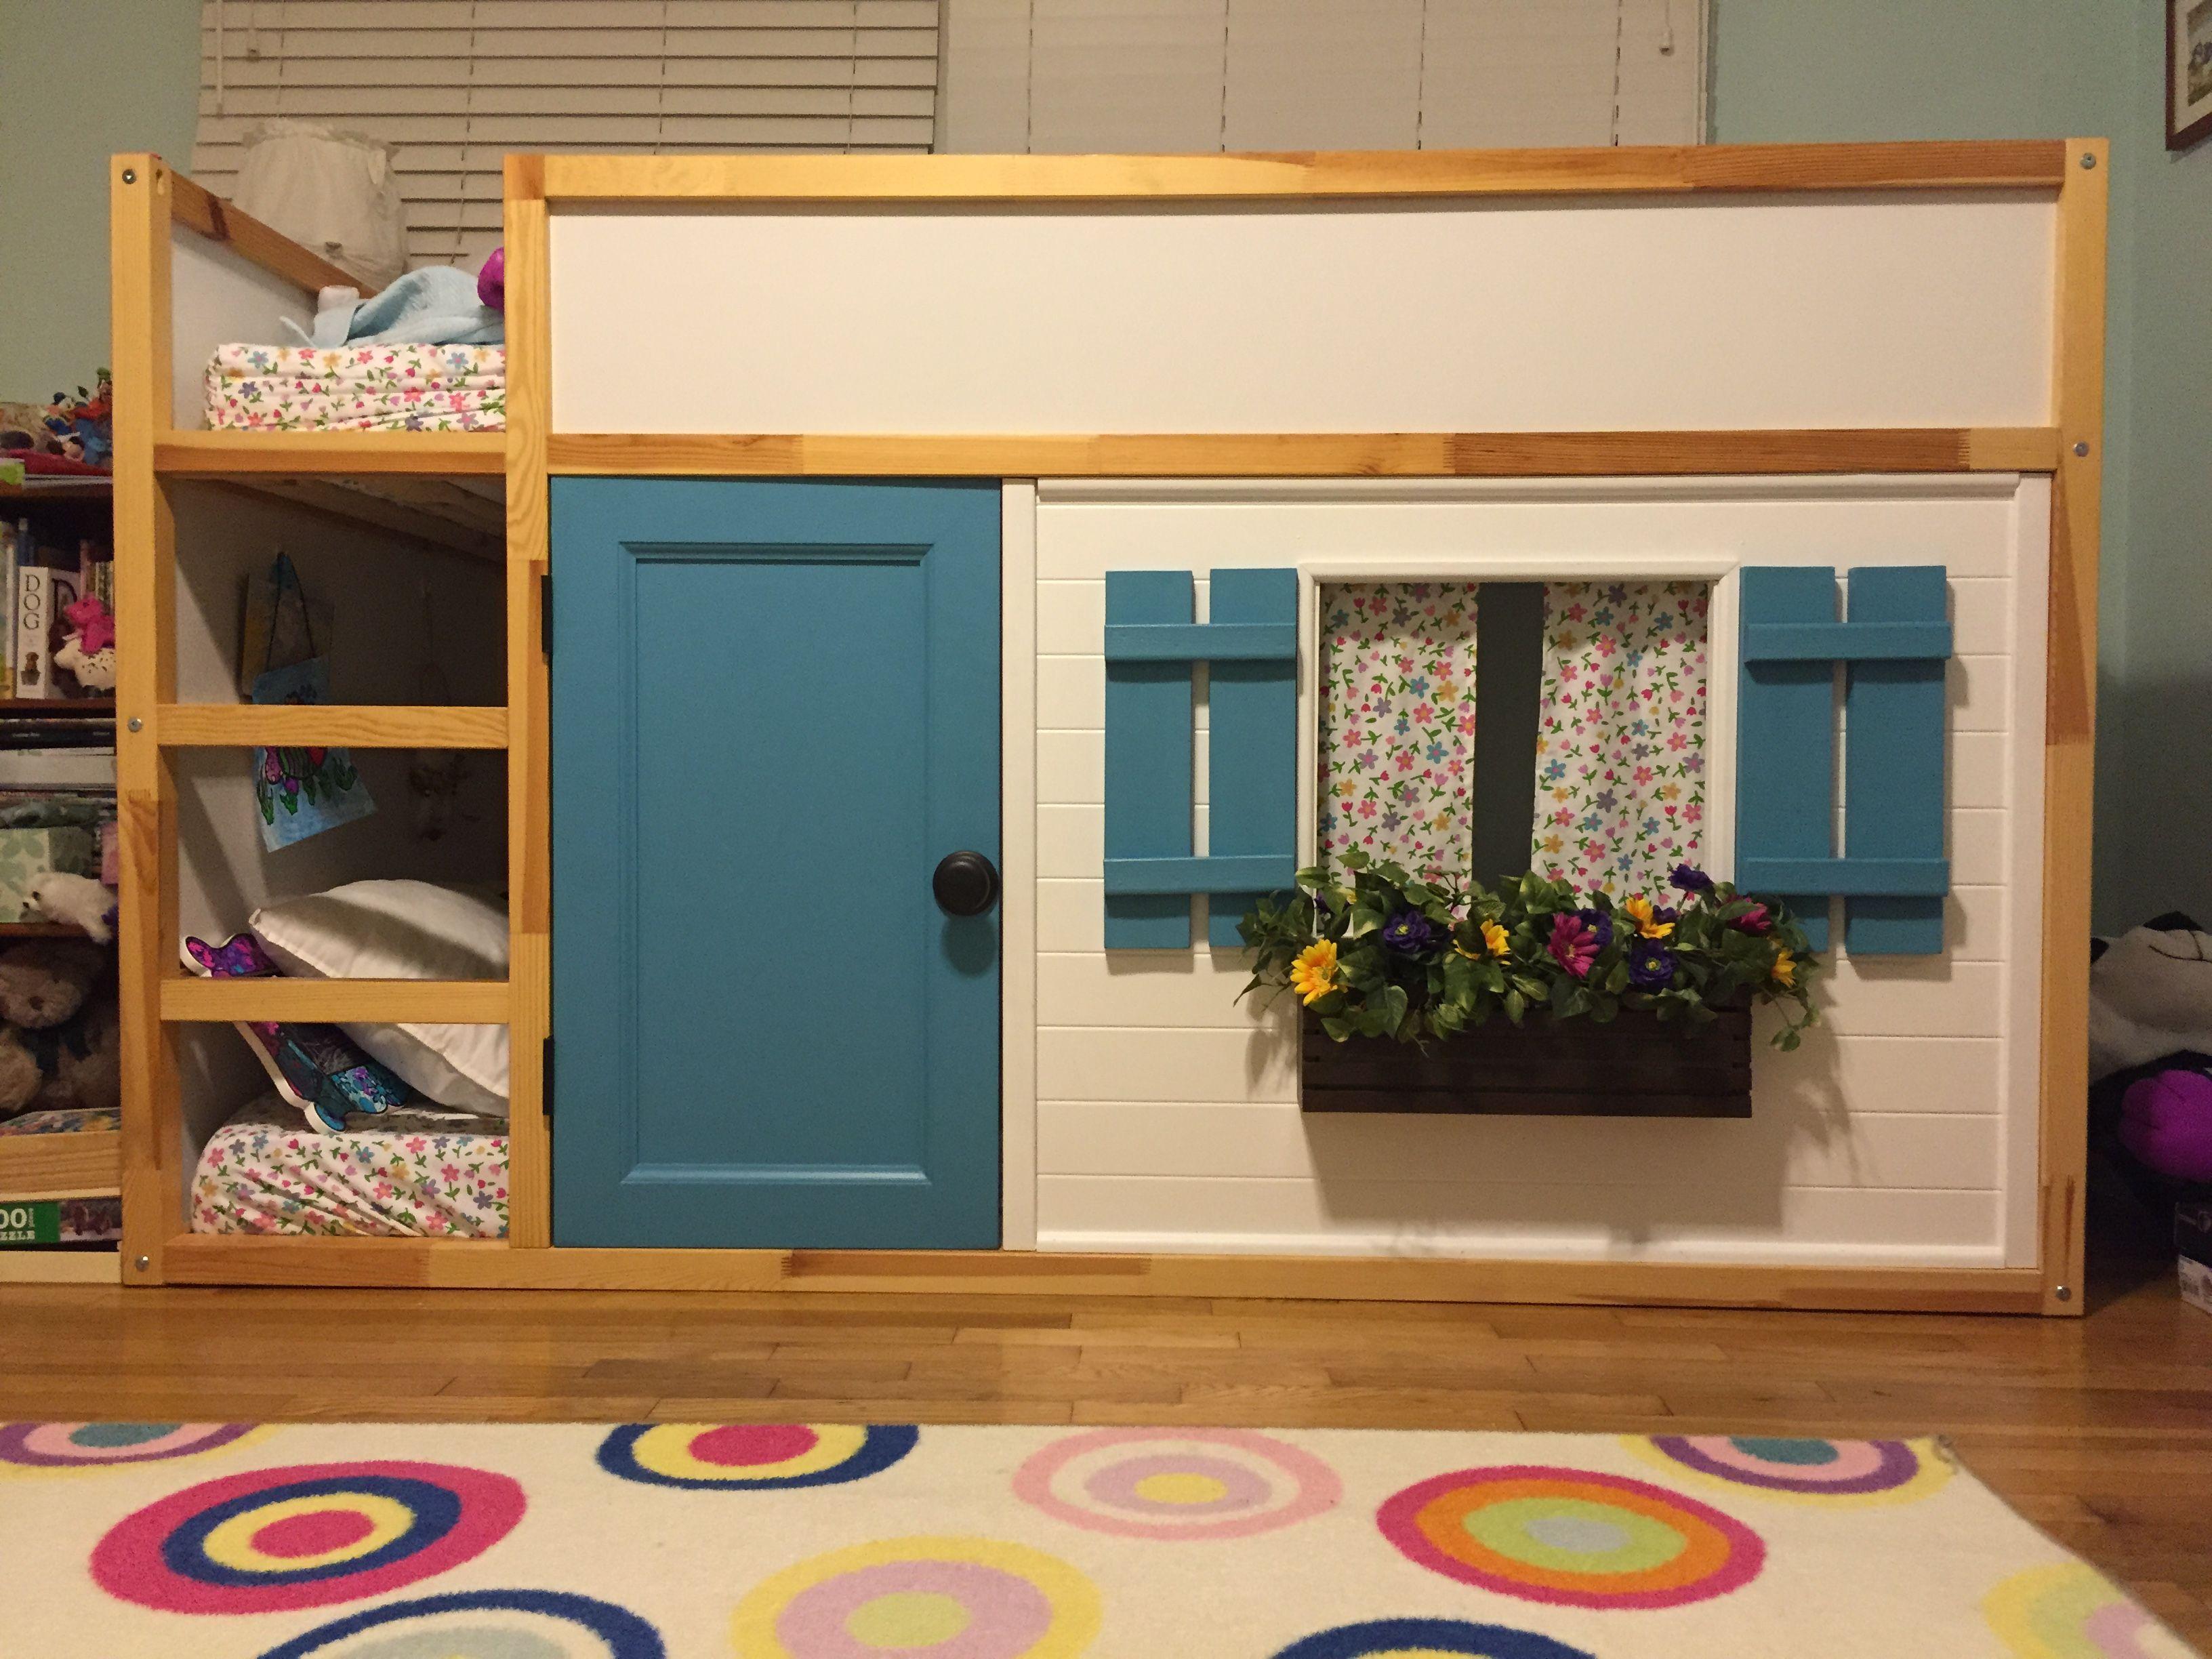 hochbett idee diy kinderzimmer hochb. Black Bedroom Furniture Sets. Home Design Ideas